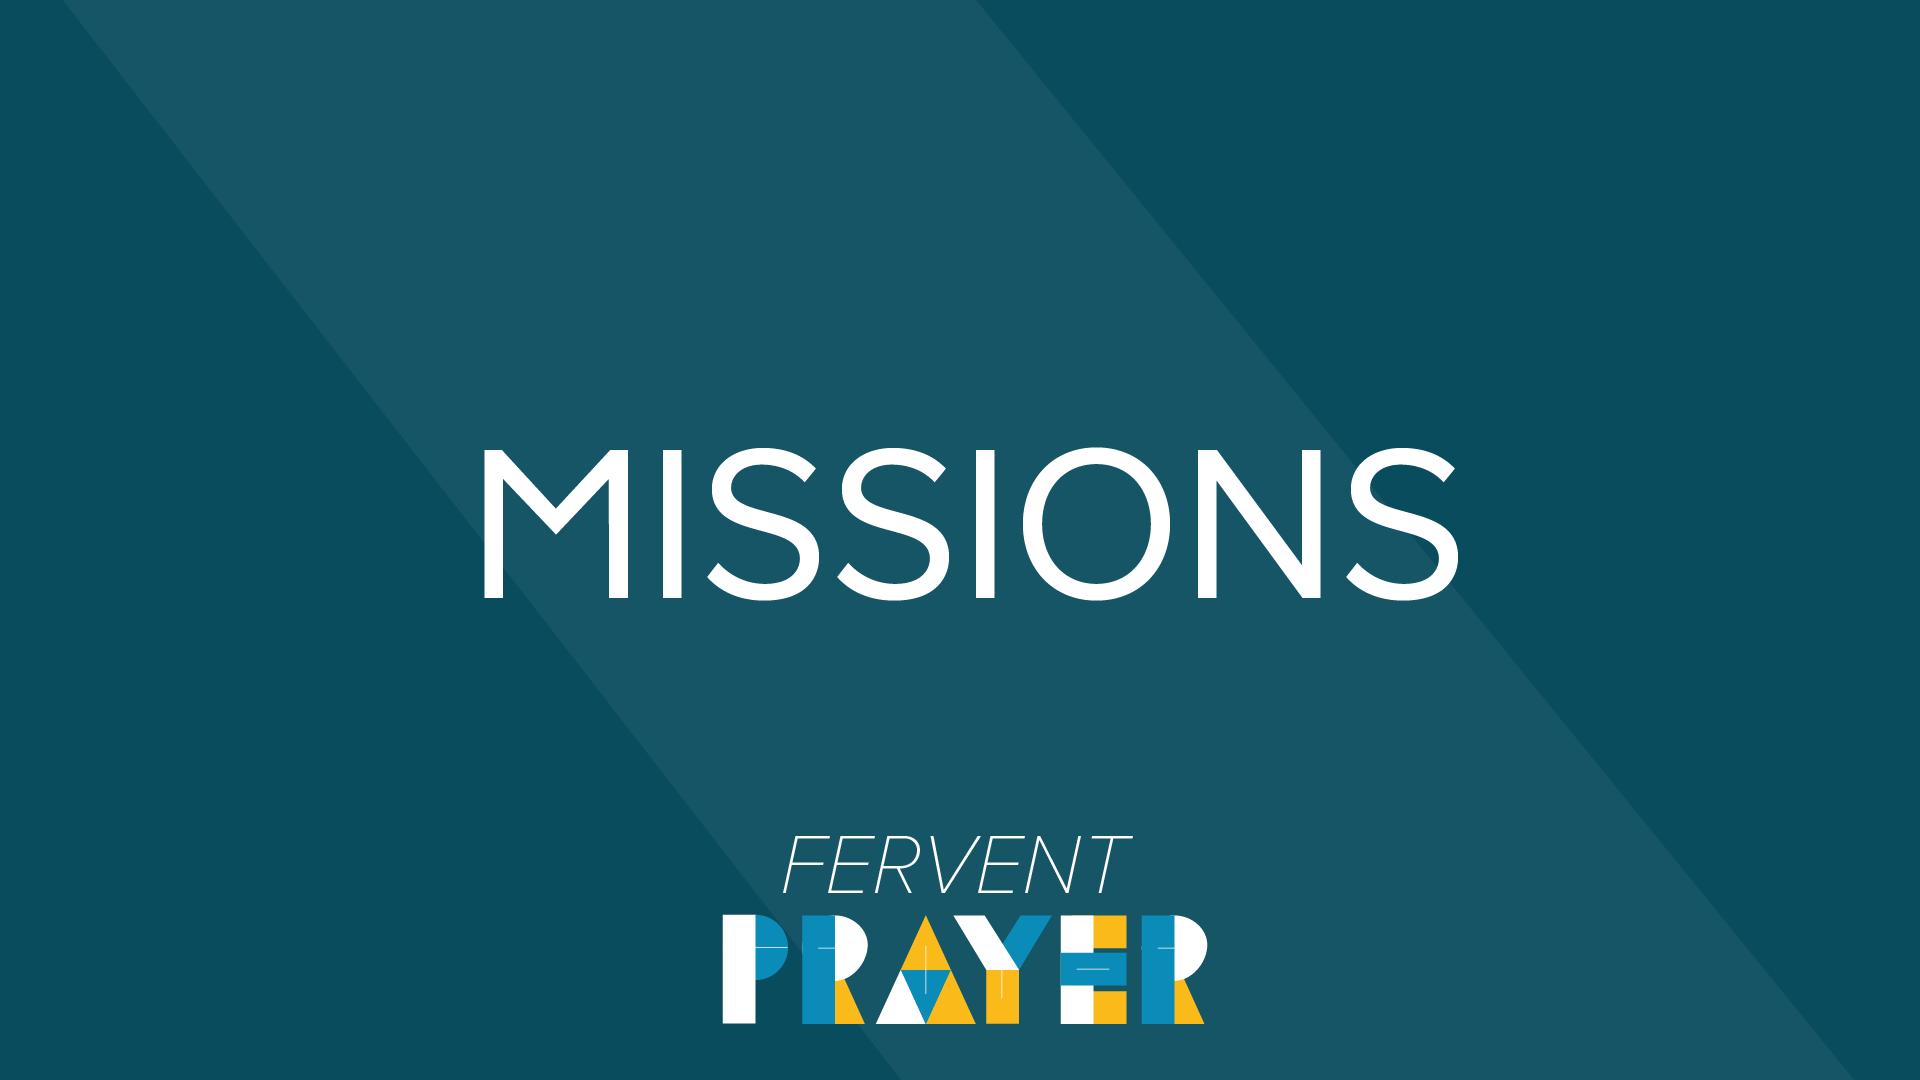 fervent prayer missions